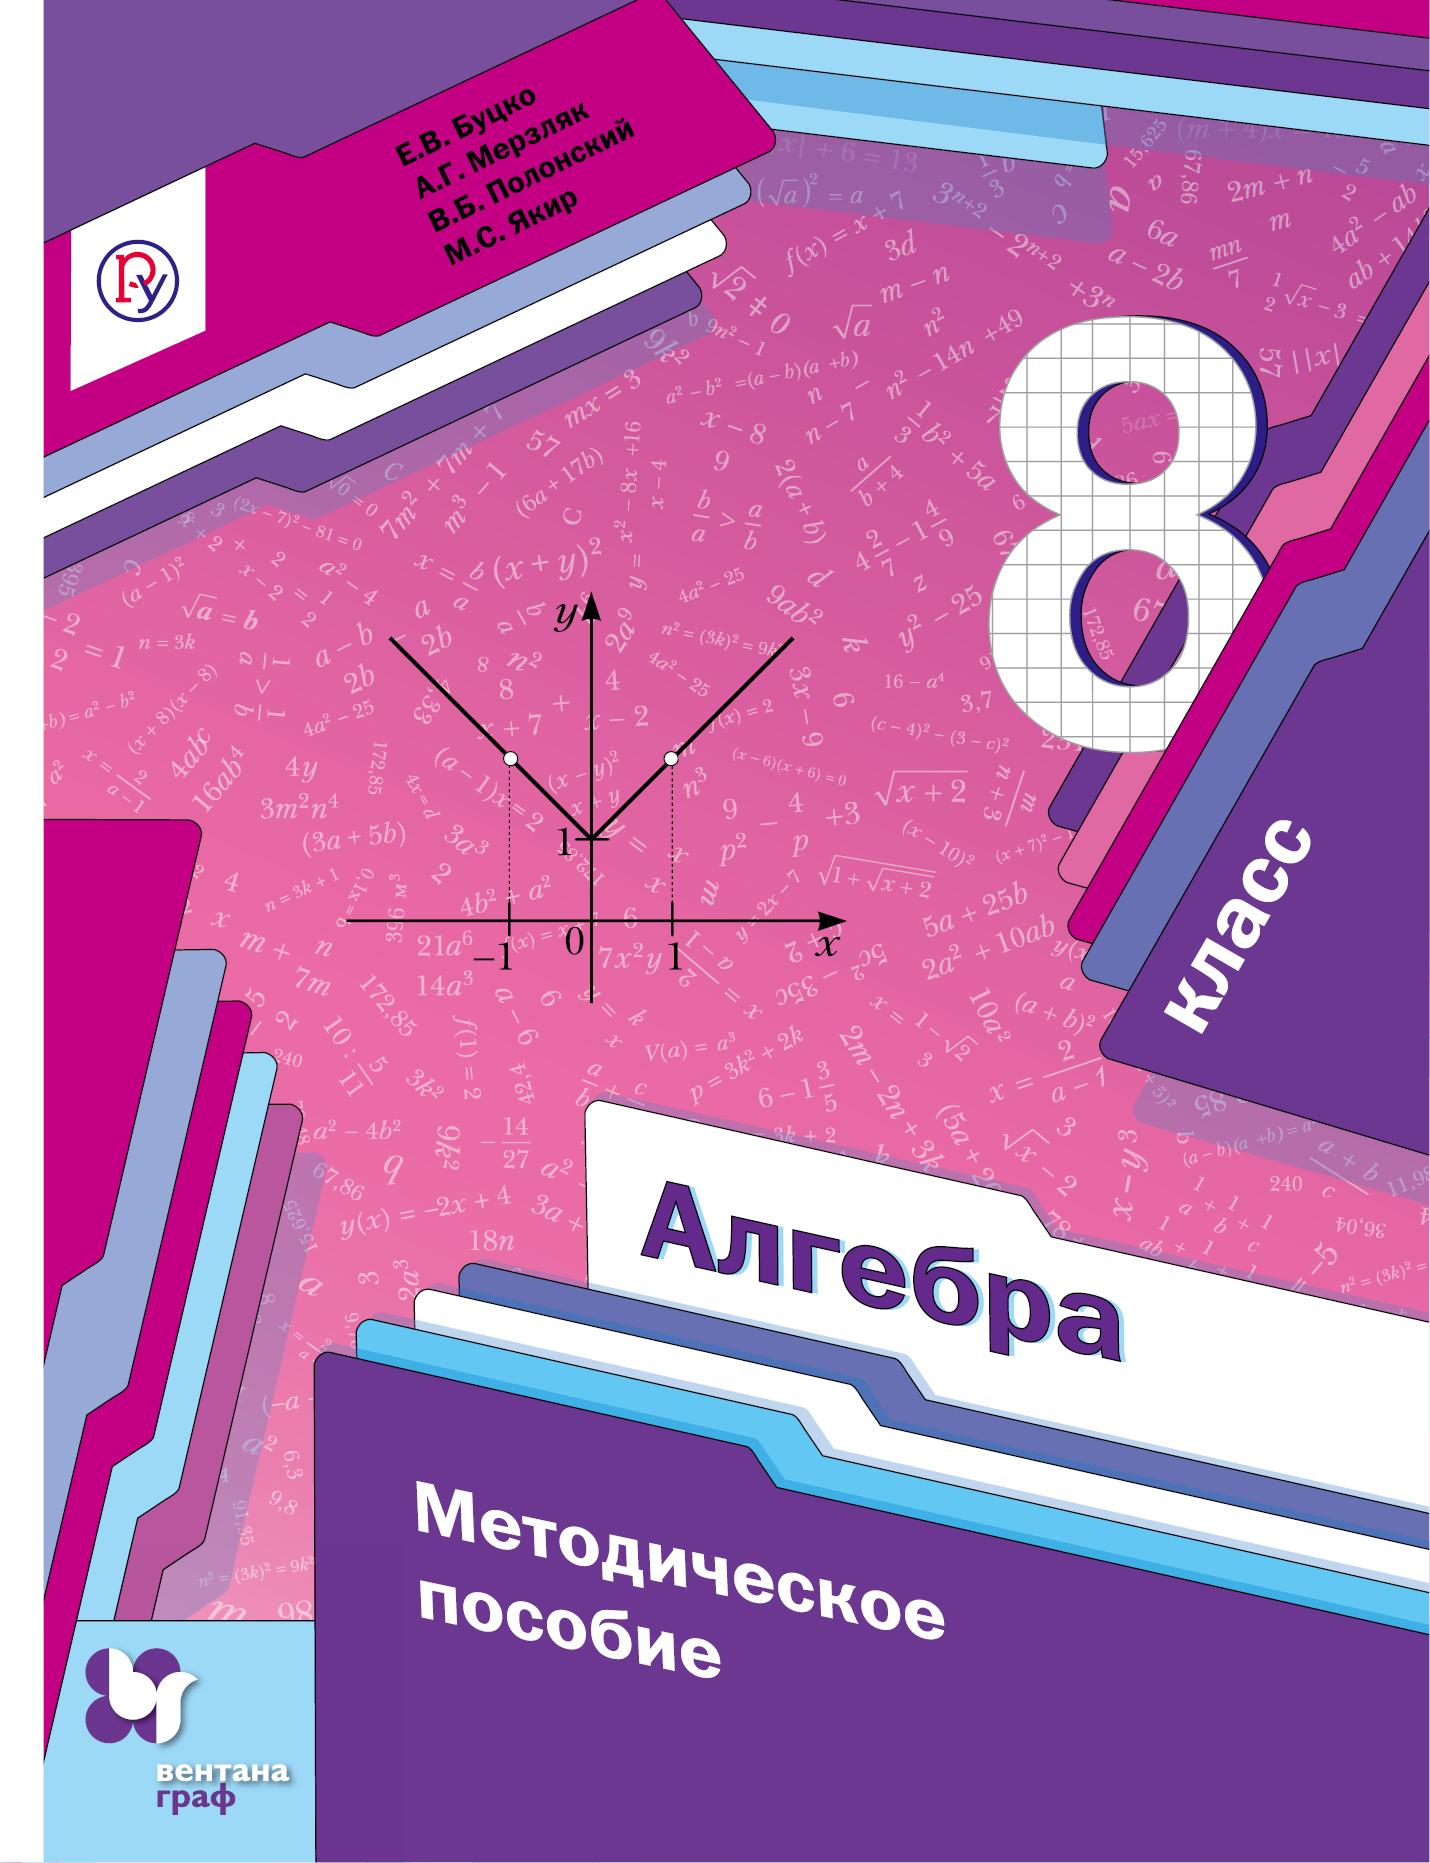 Алгебра. 8класс. Методическое пособие.